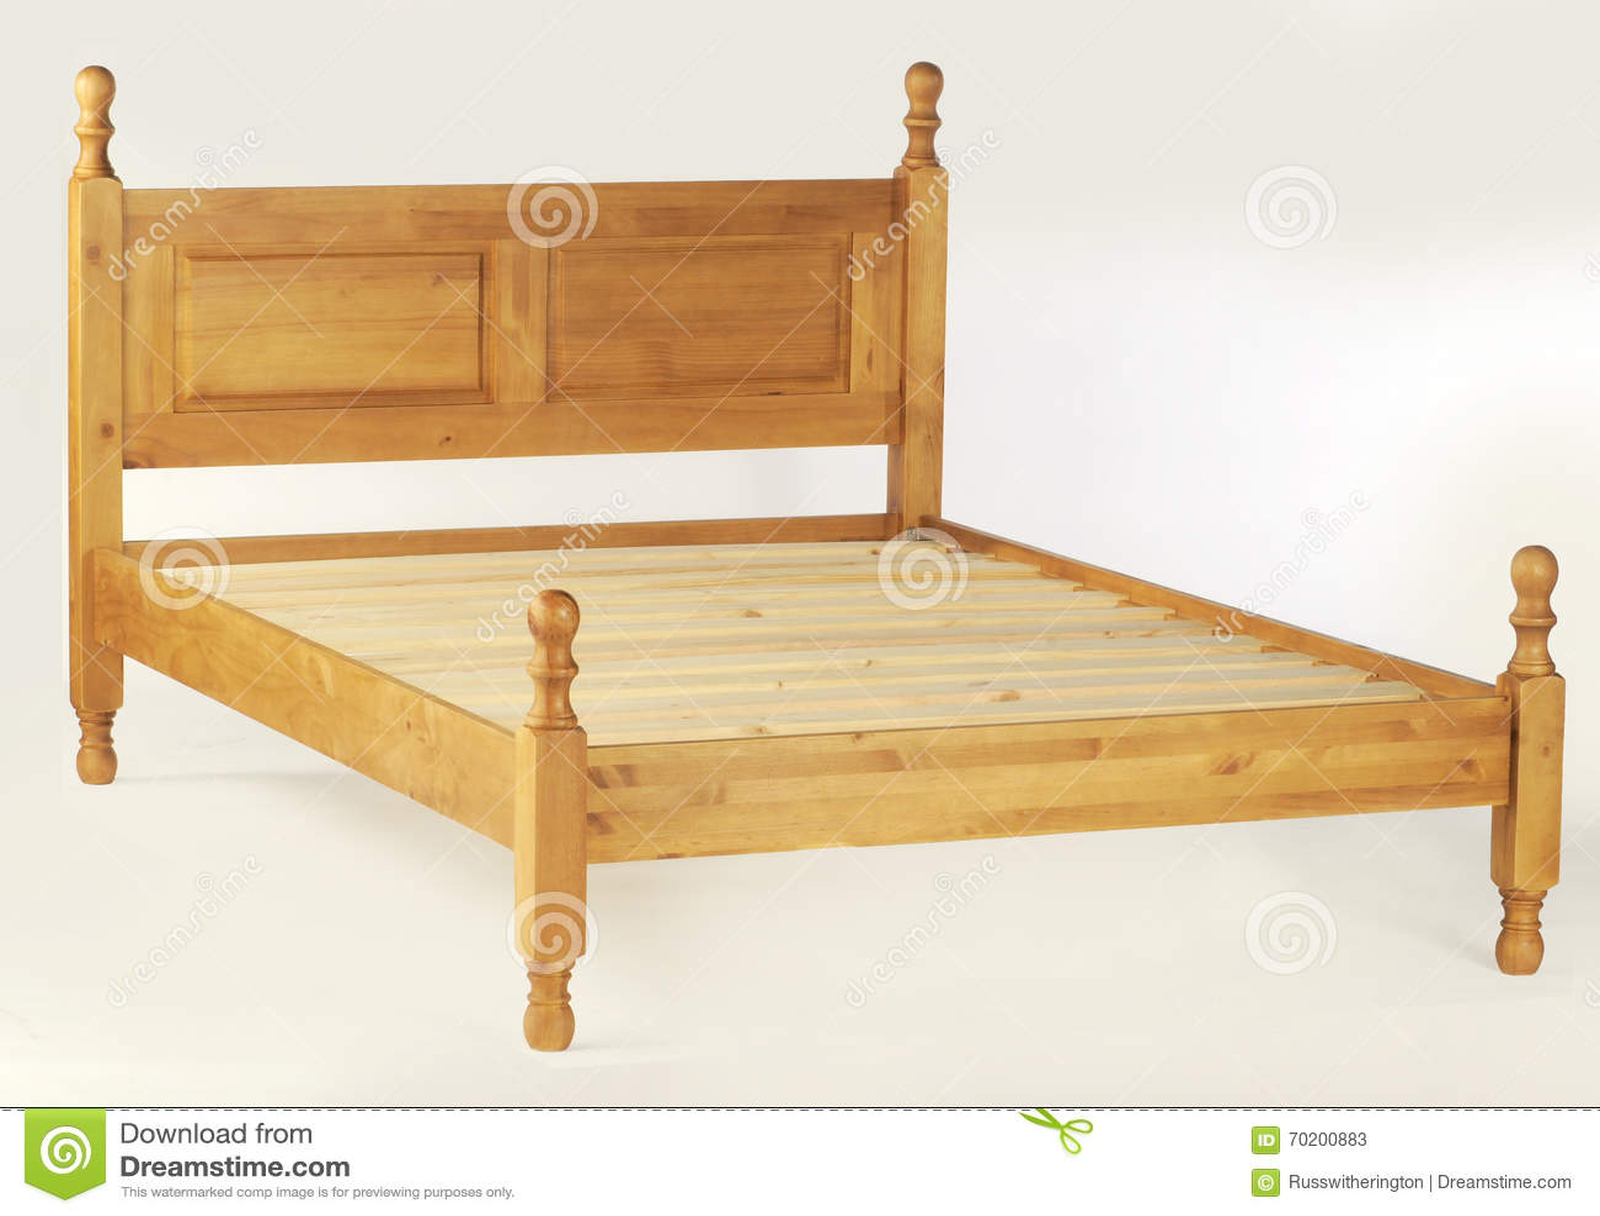 Cama matrimonial imagen de archivo. Imagen de madera - 70200883